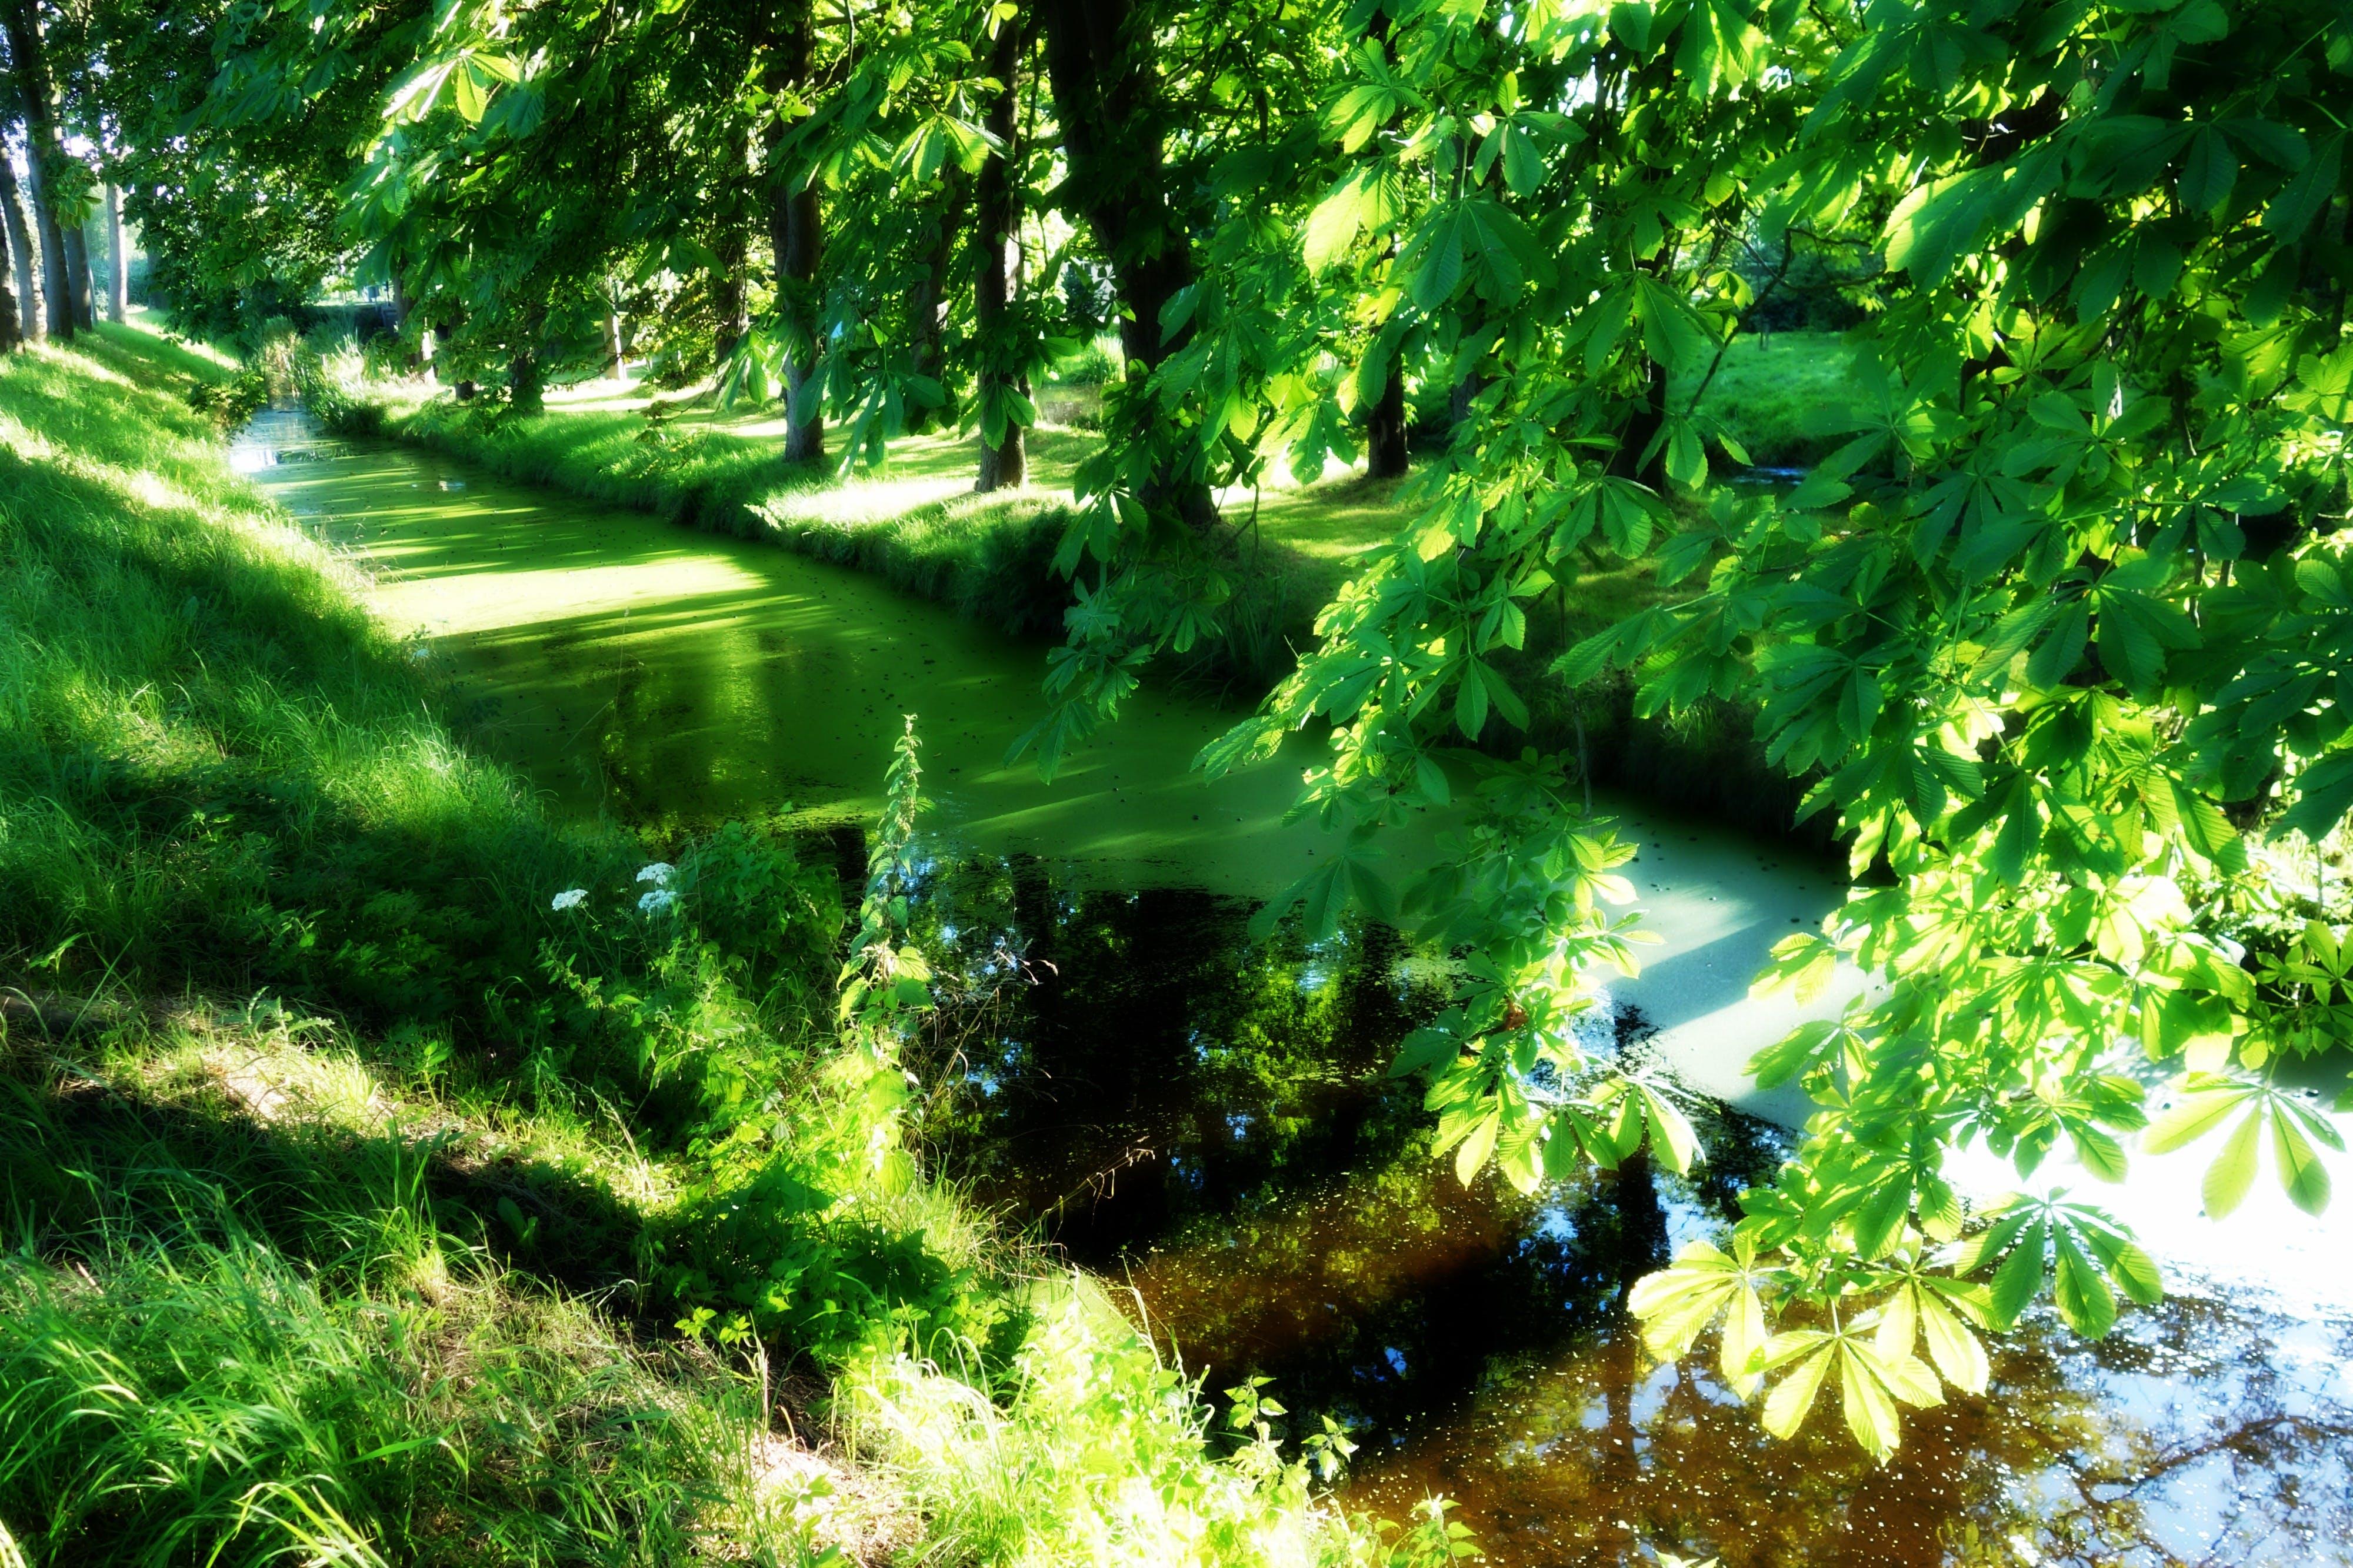 Free stock photo of landscape, water, sunshine, foliage